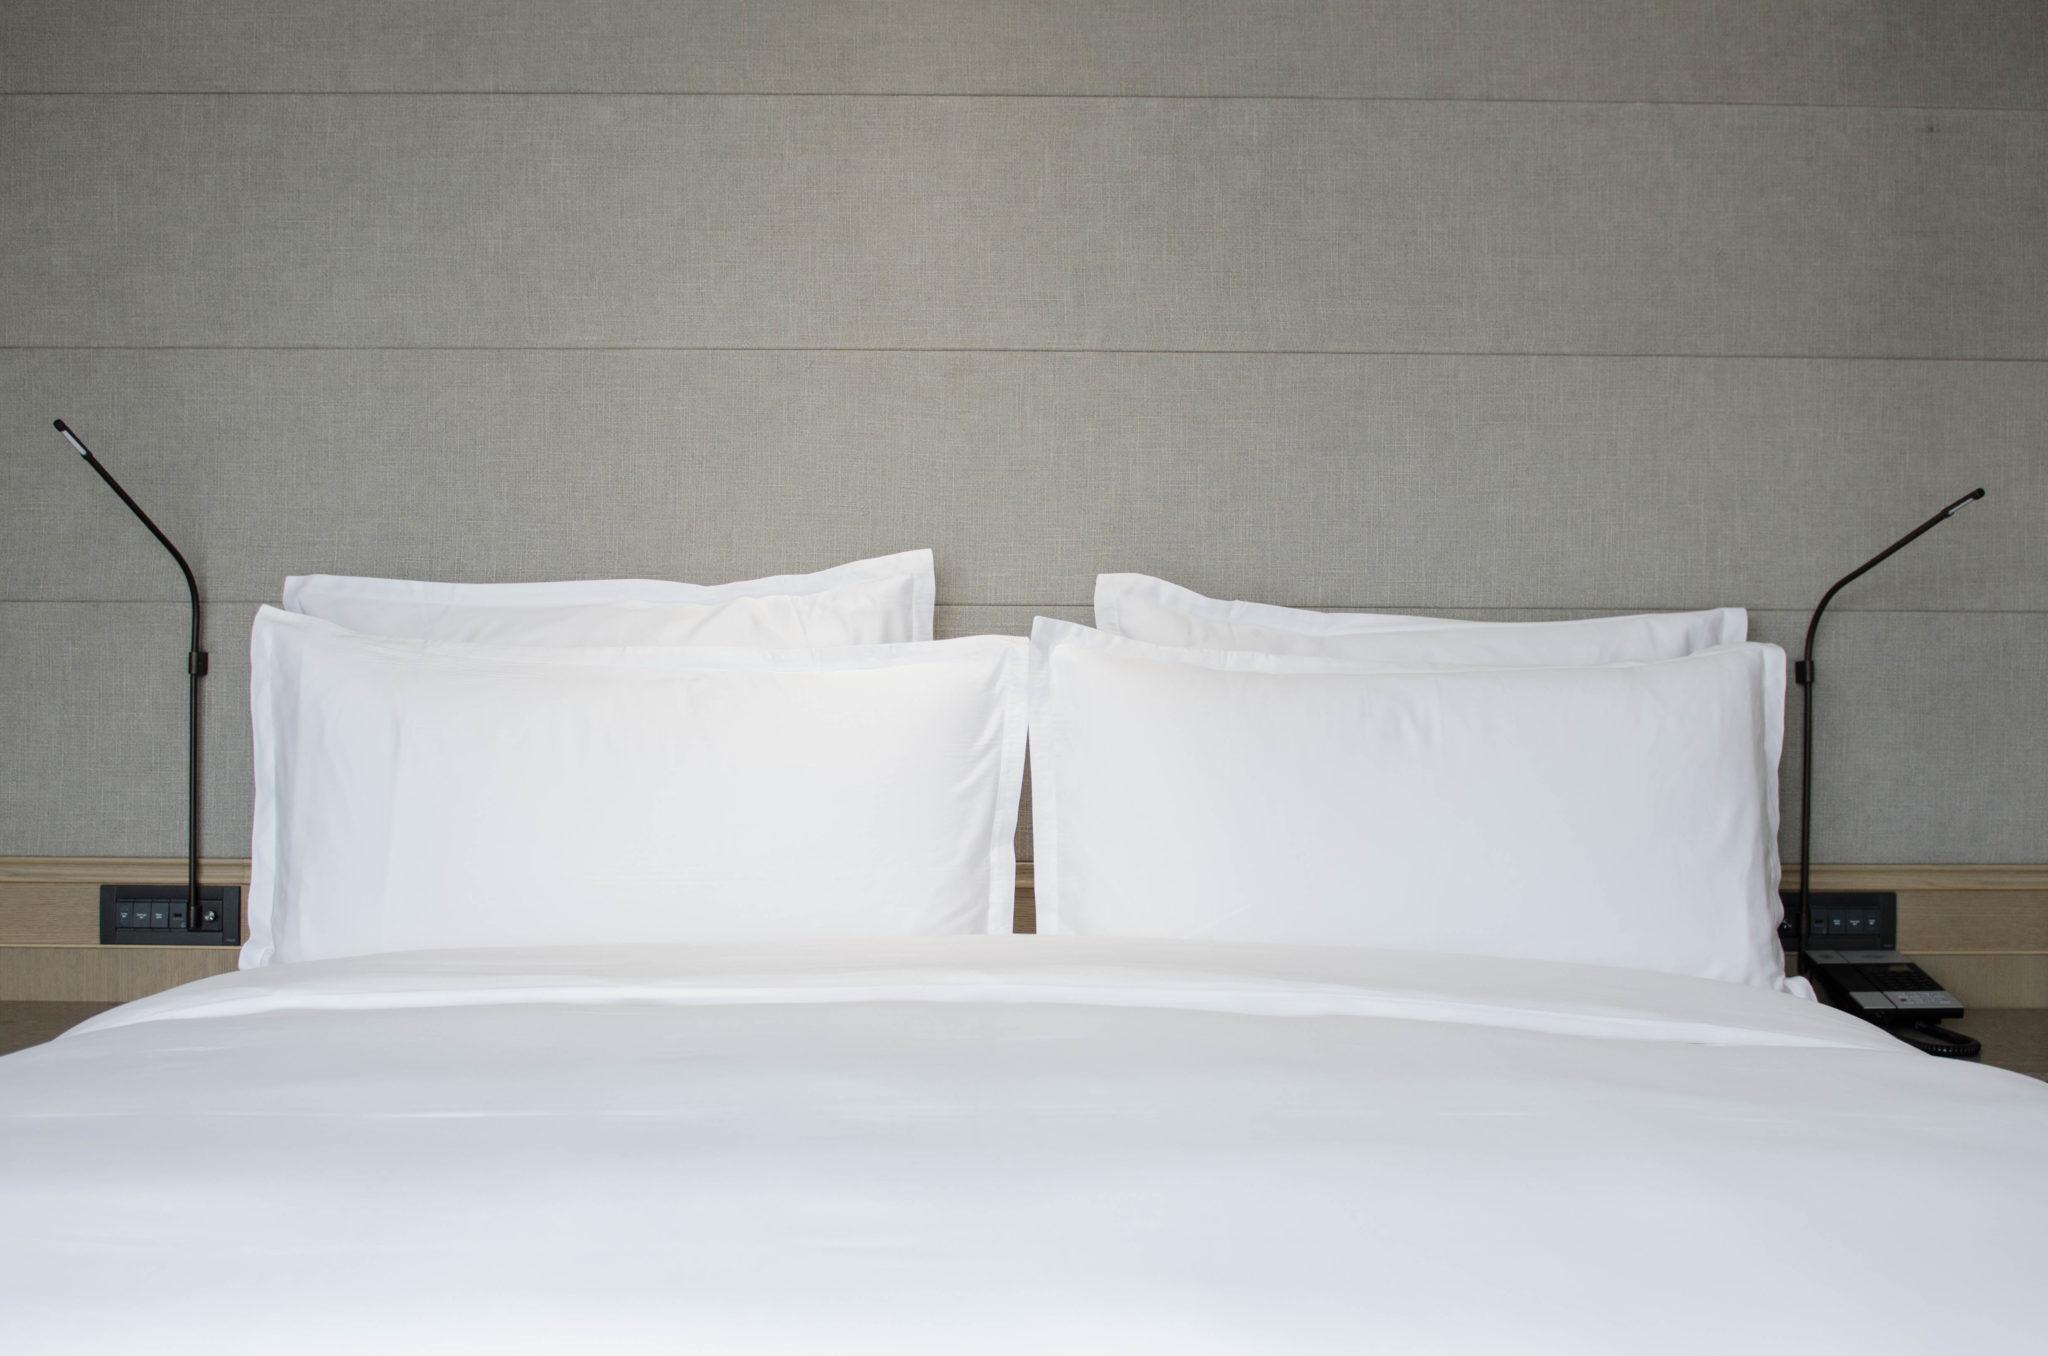 Die Betten im Zimmer im Hotel in Chaoyang in Peking